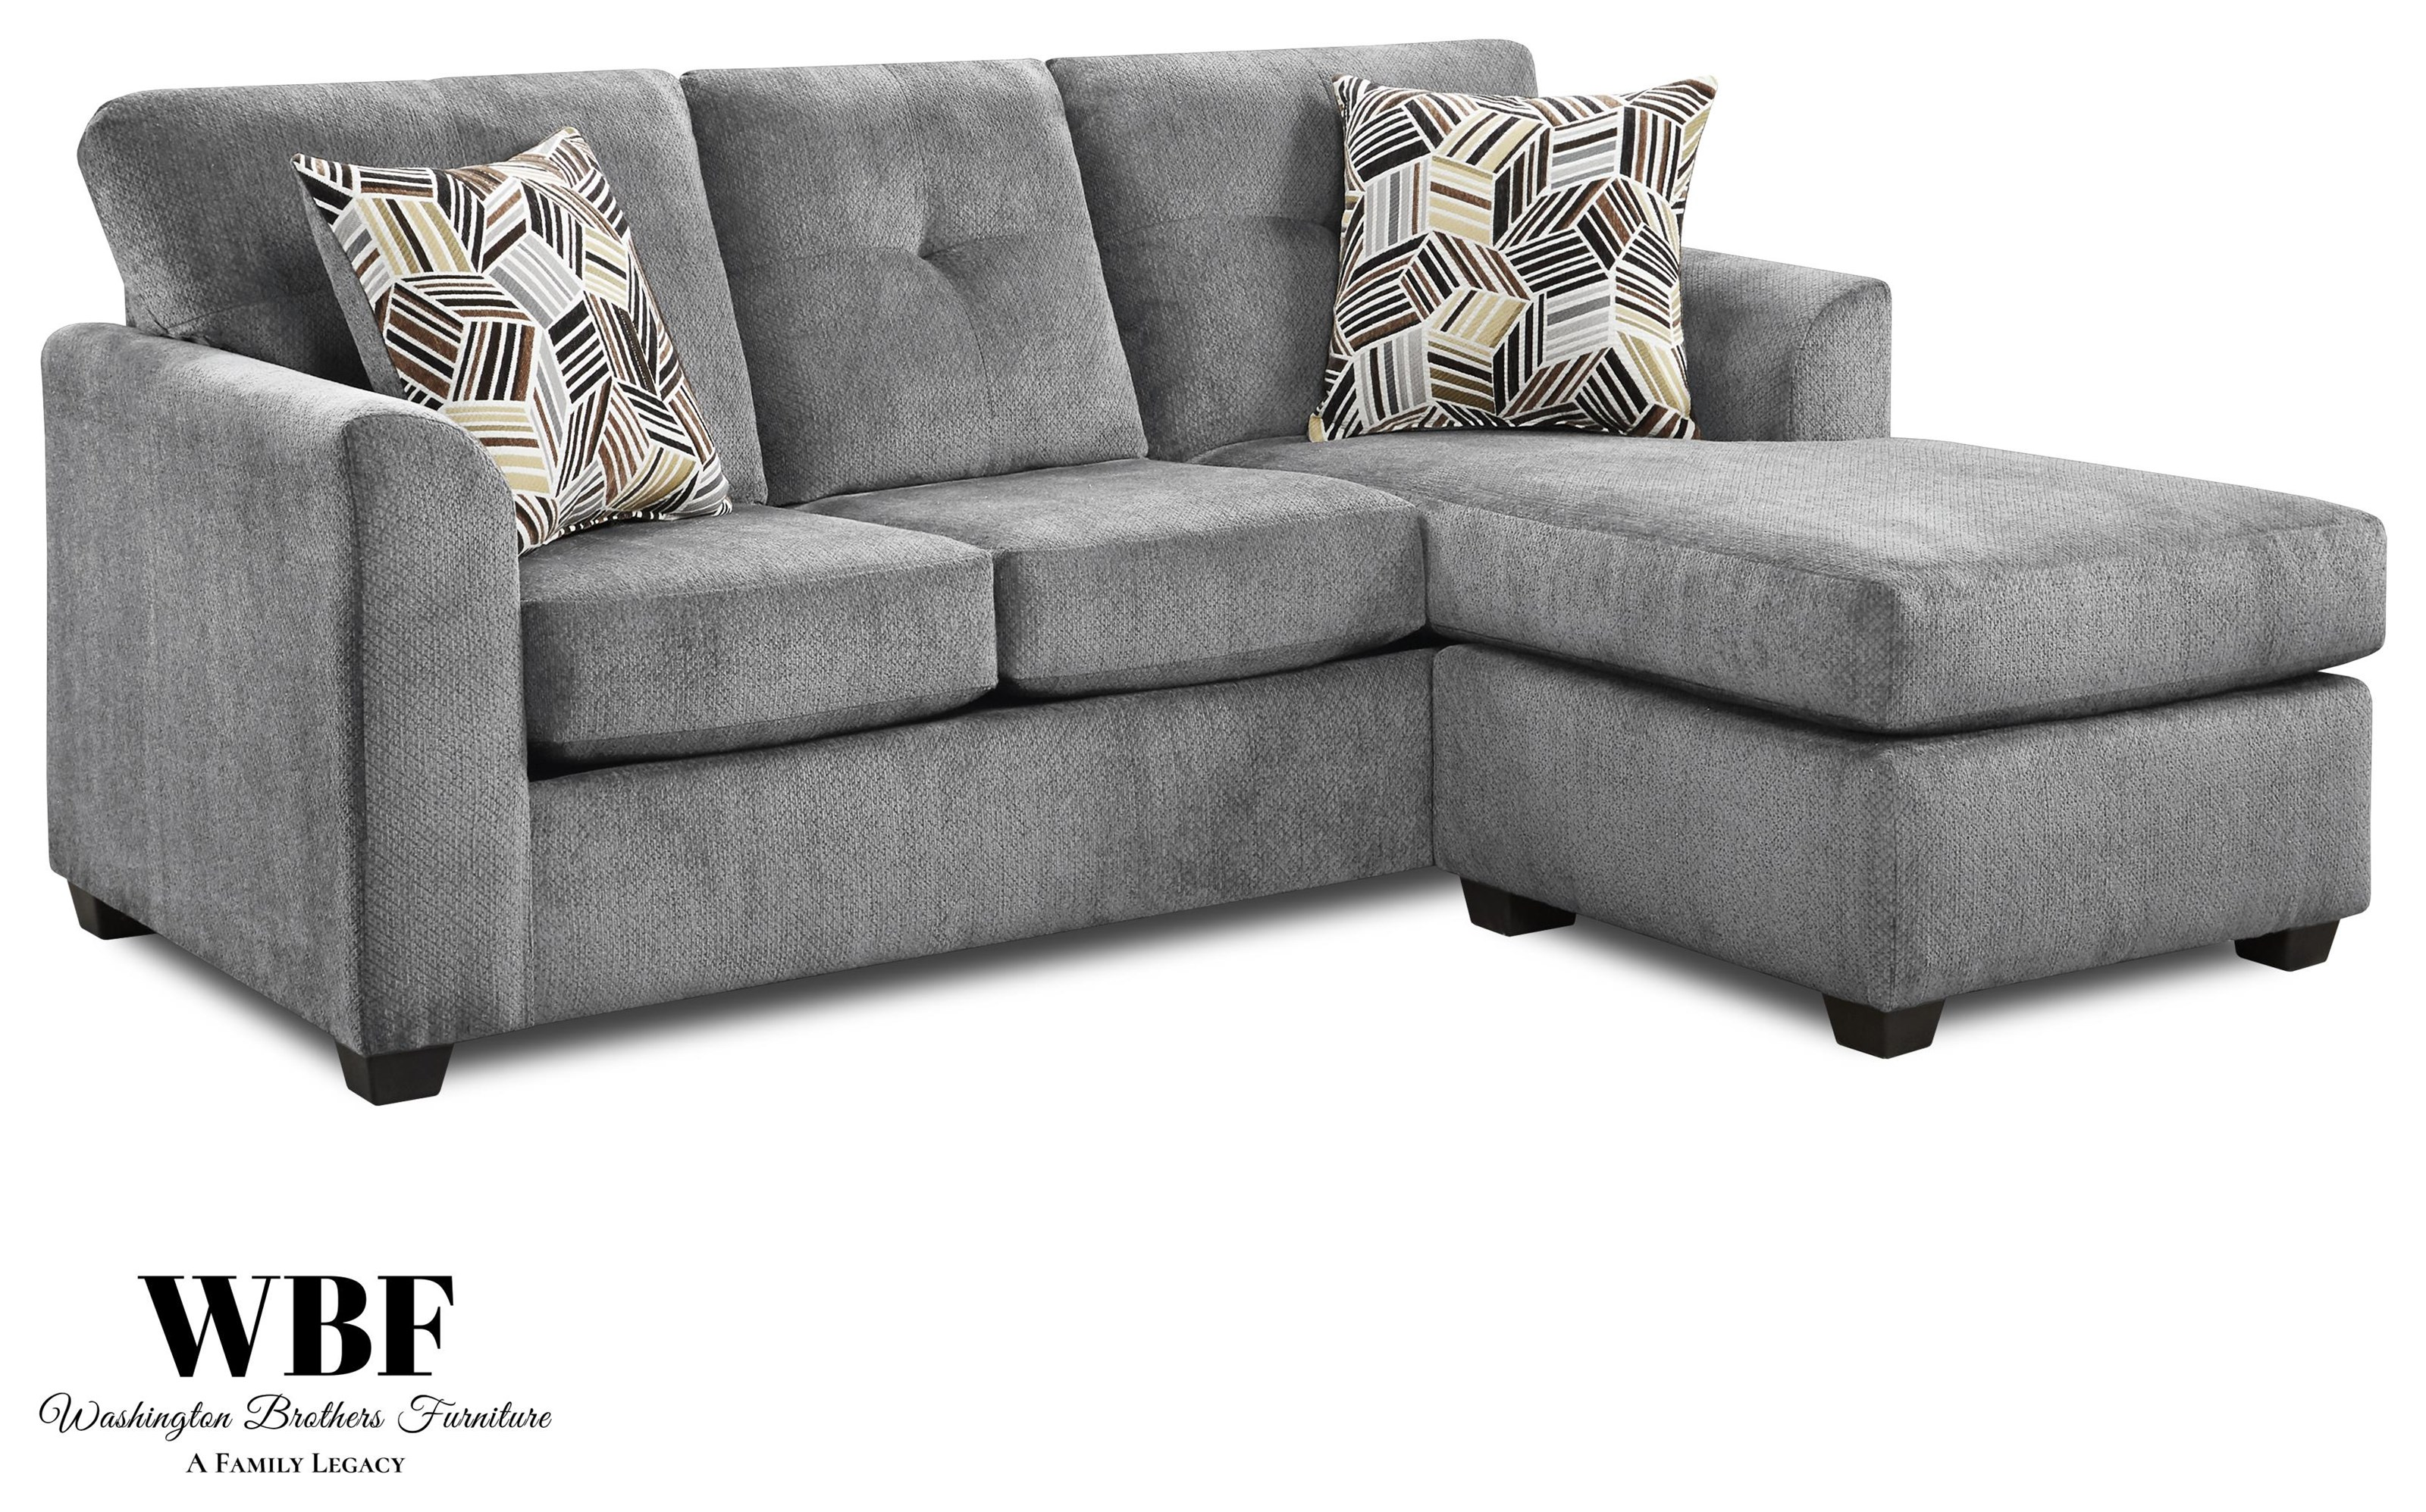 3000 Sofa Chaise by Washington Brothers Furniture at Furniture Fair - North Carolina